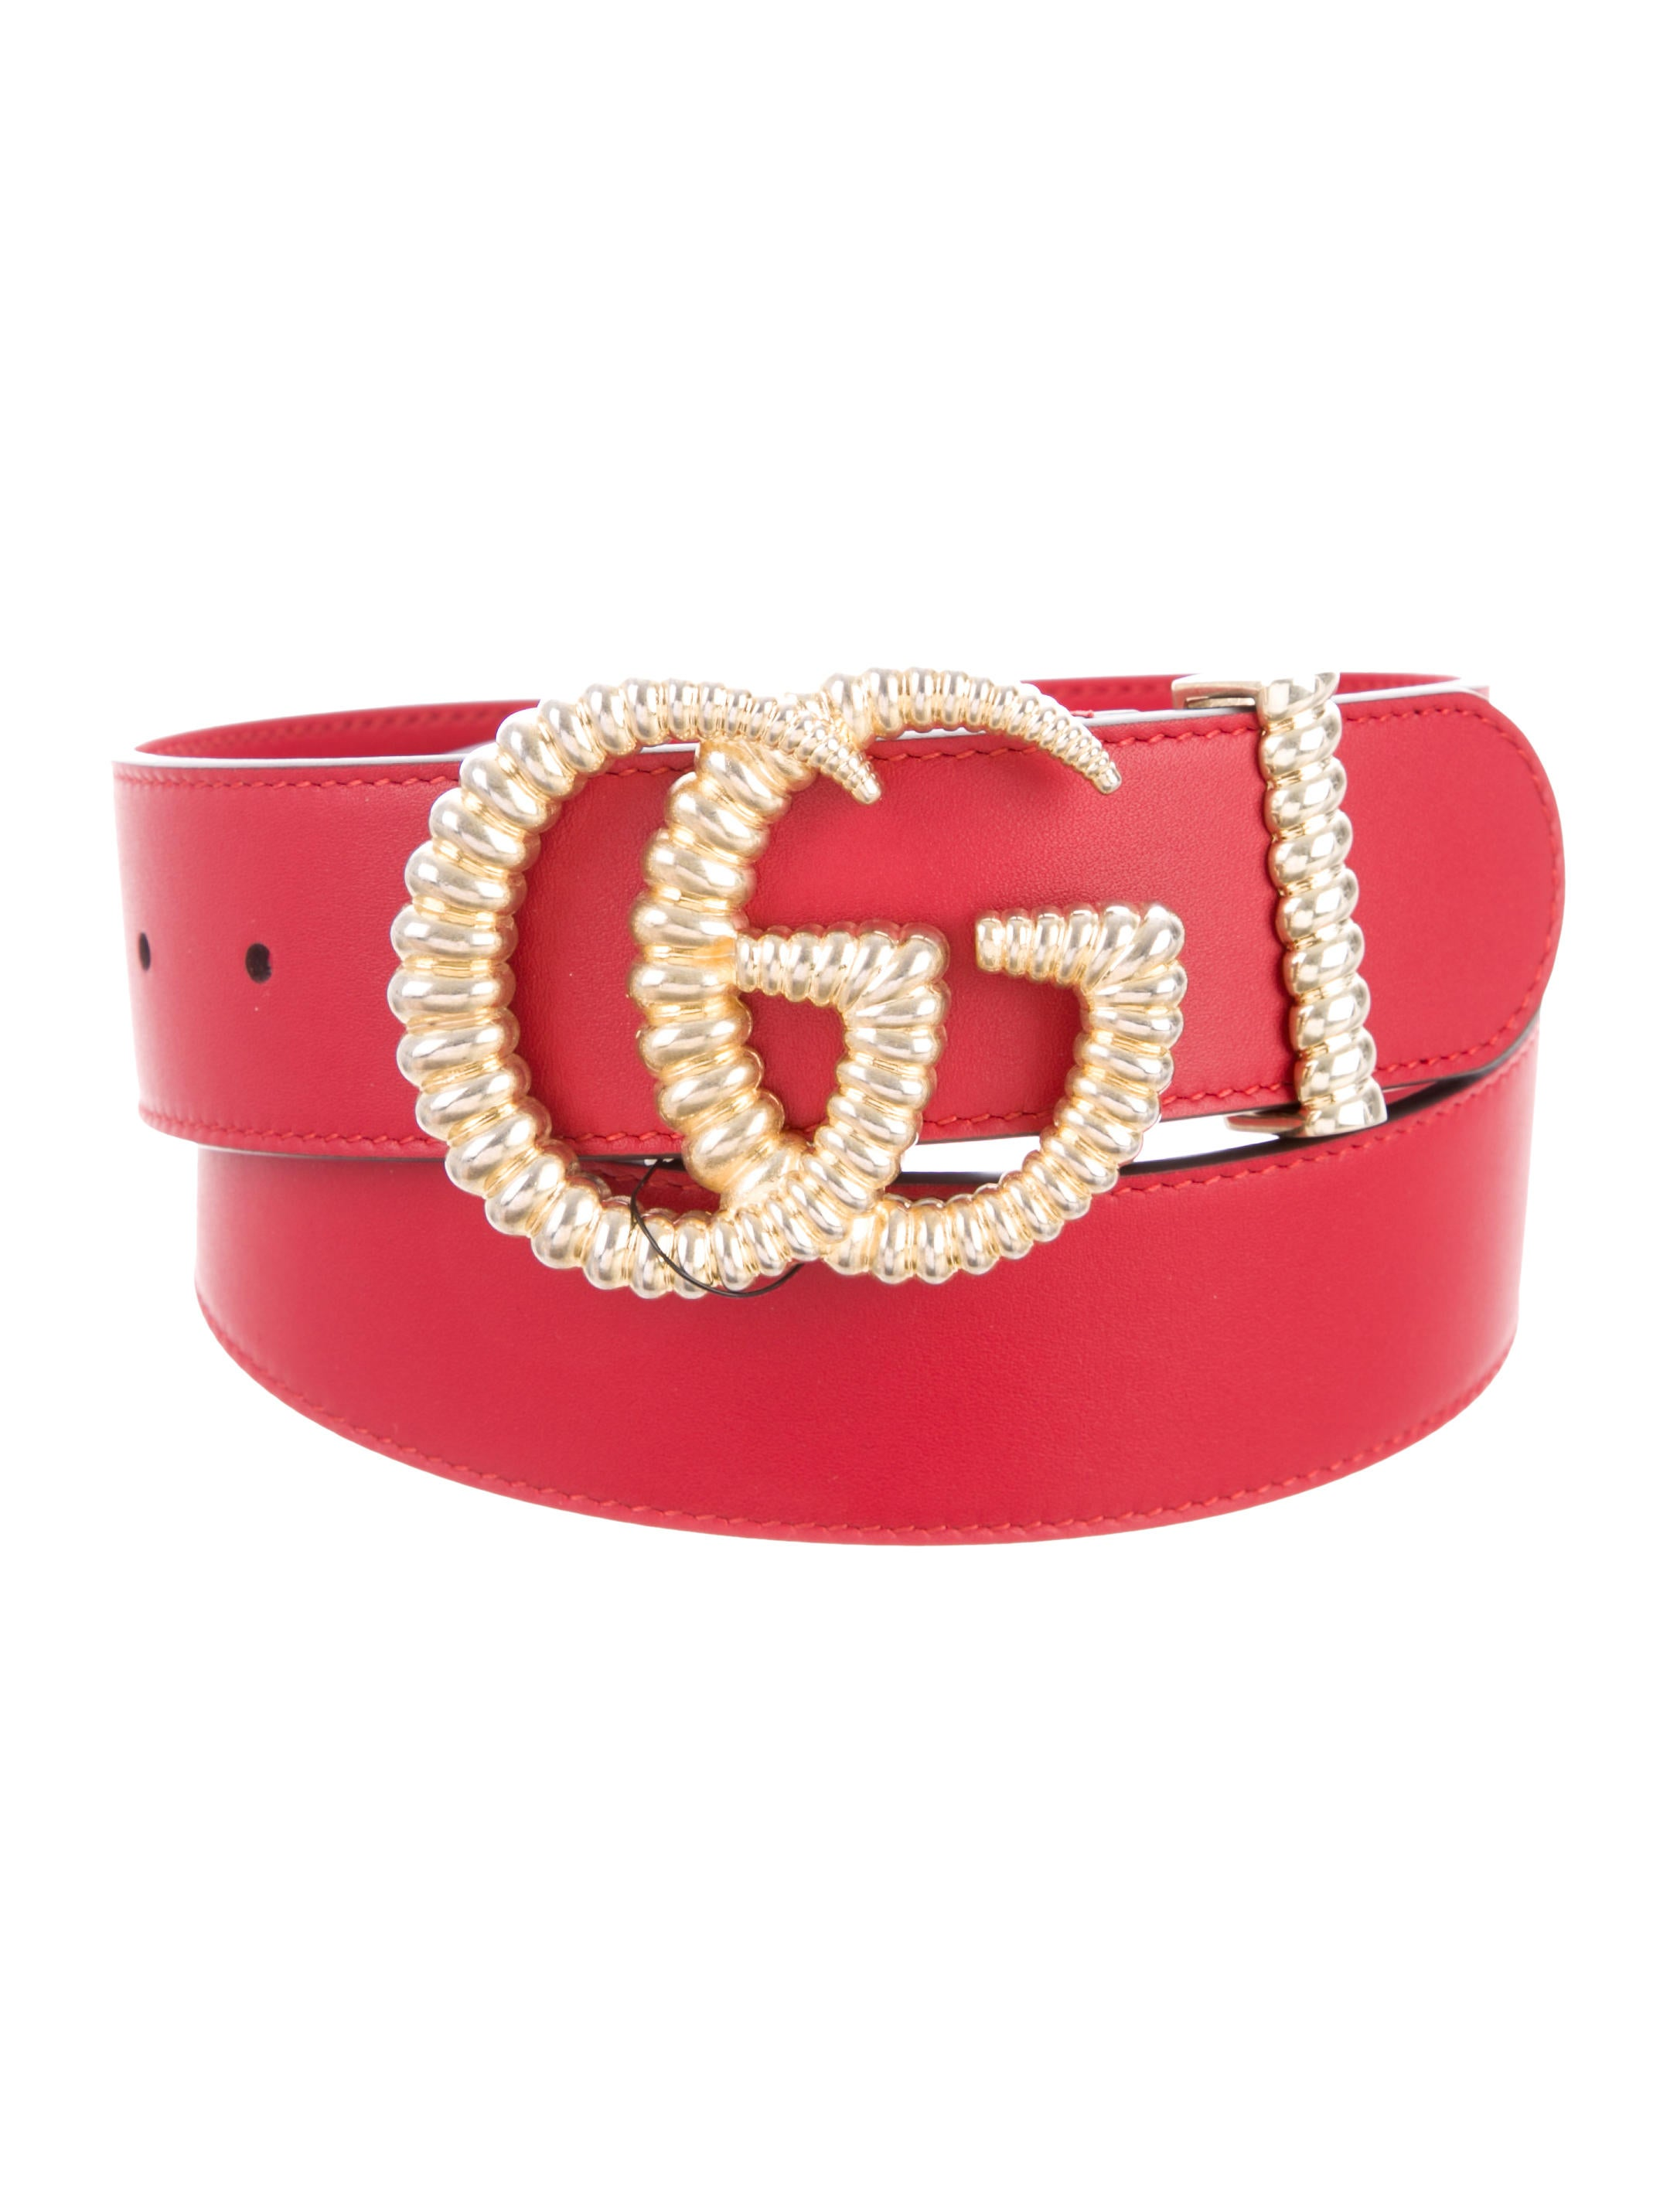 ec22efadf87 Gucci 2018 Leather GG Torchon - Accessories - GUC265770